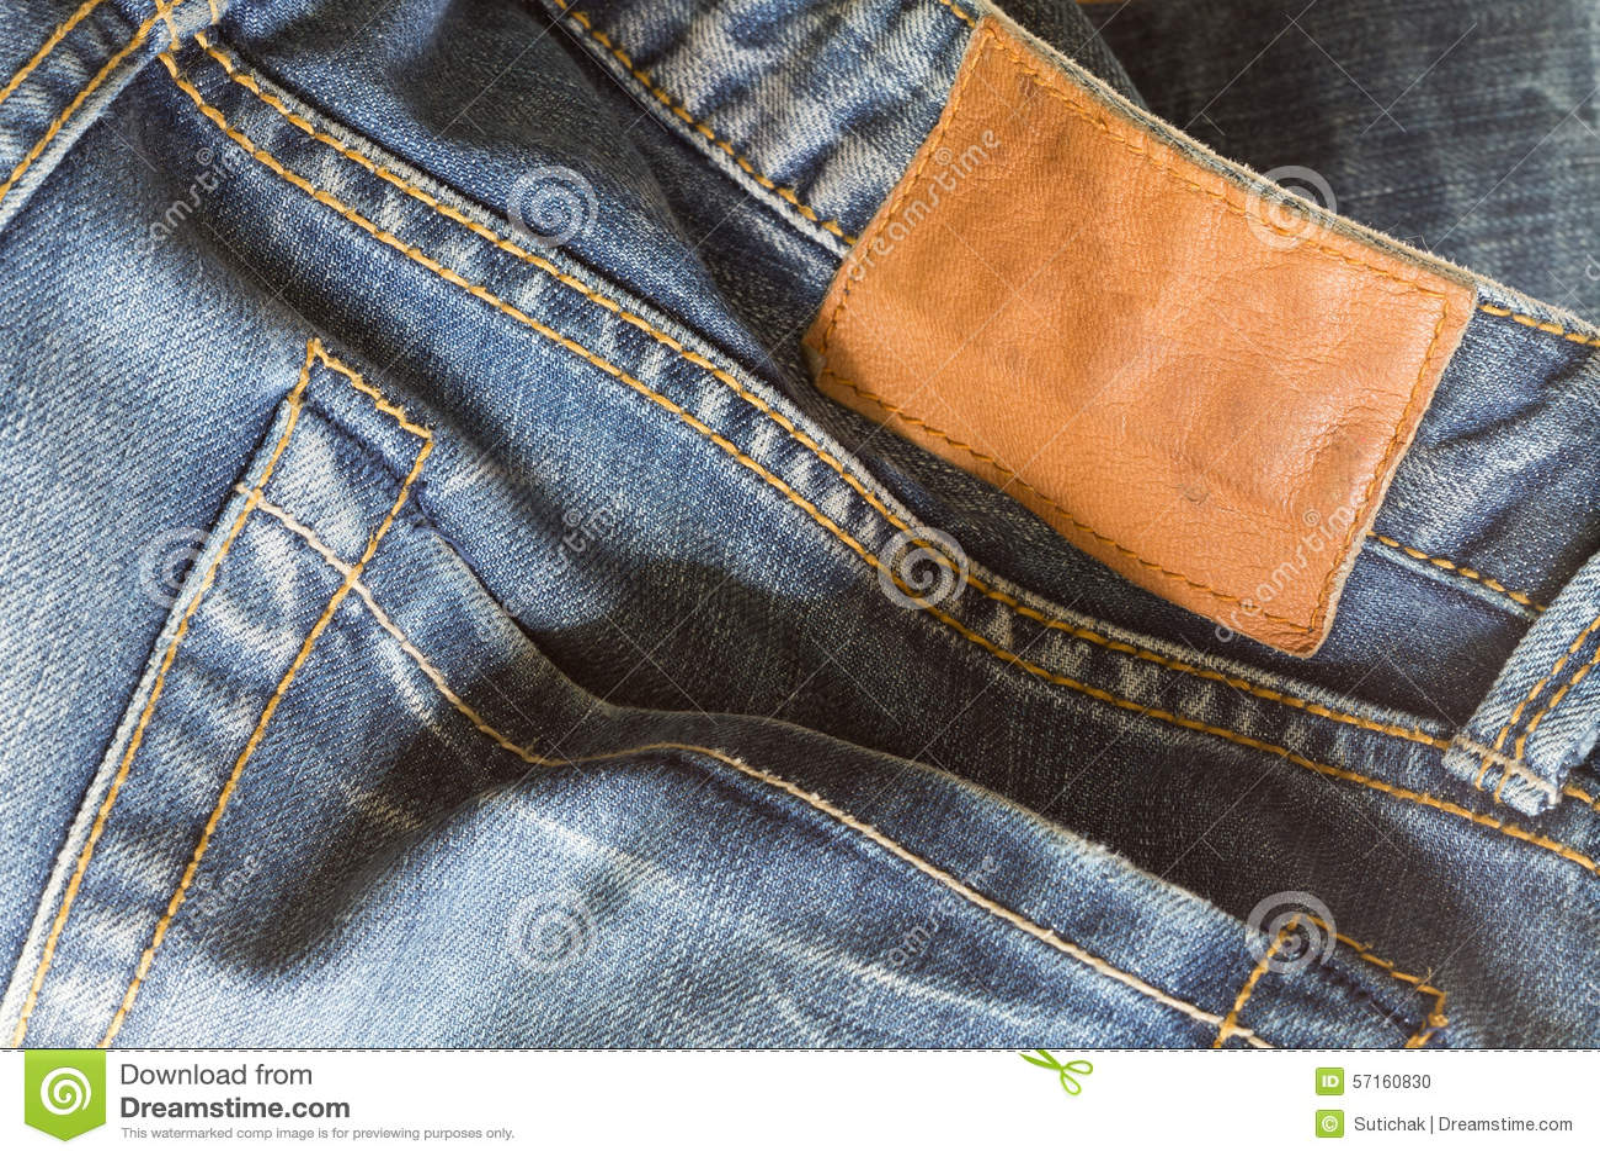 Brown Pants Royalty-Free Stock Photo